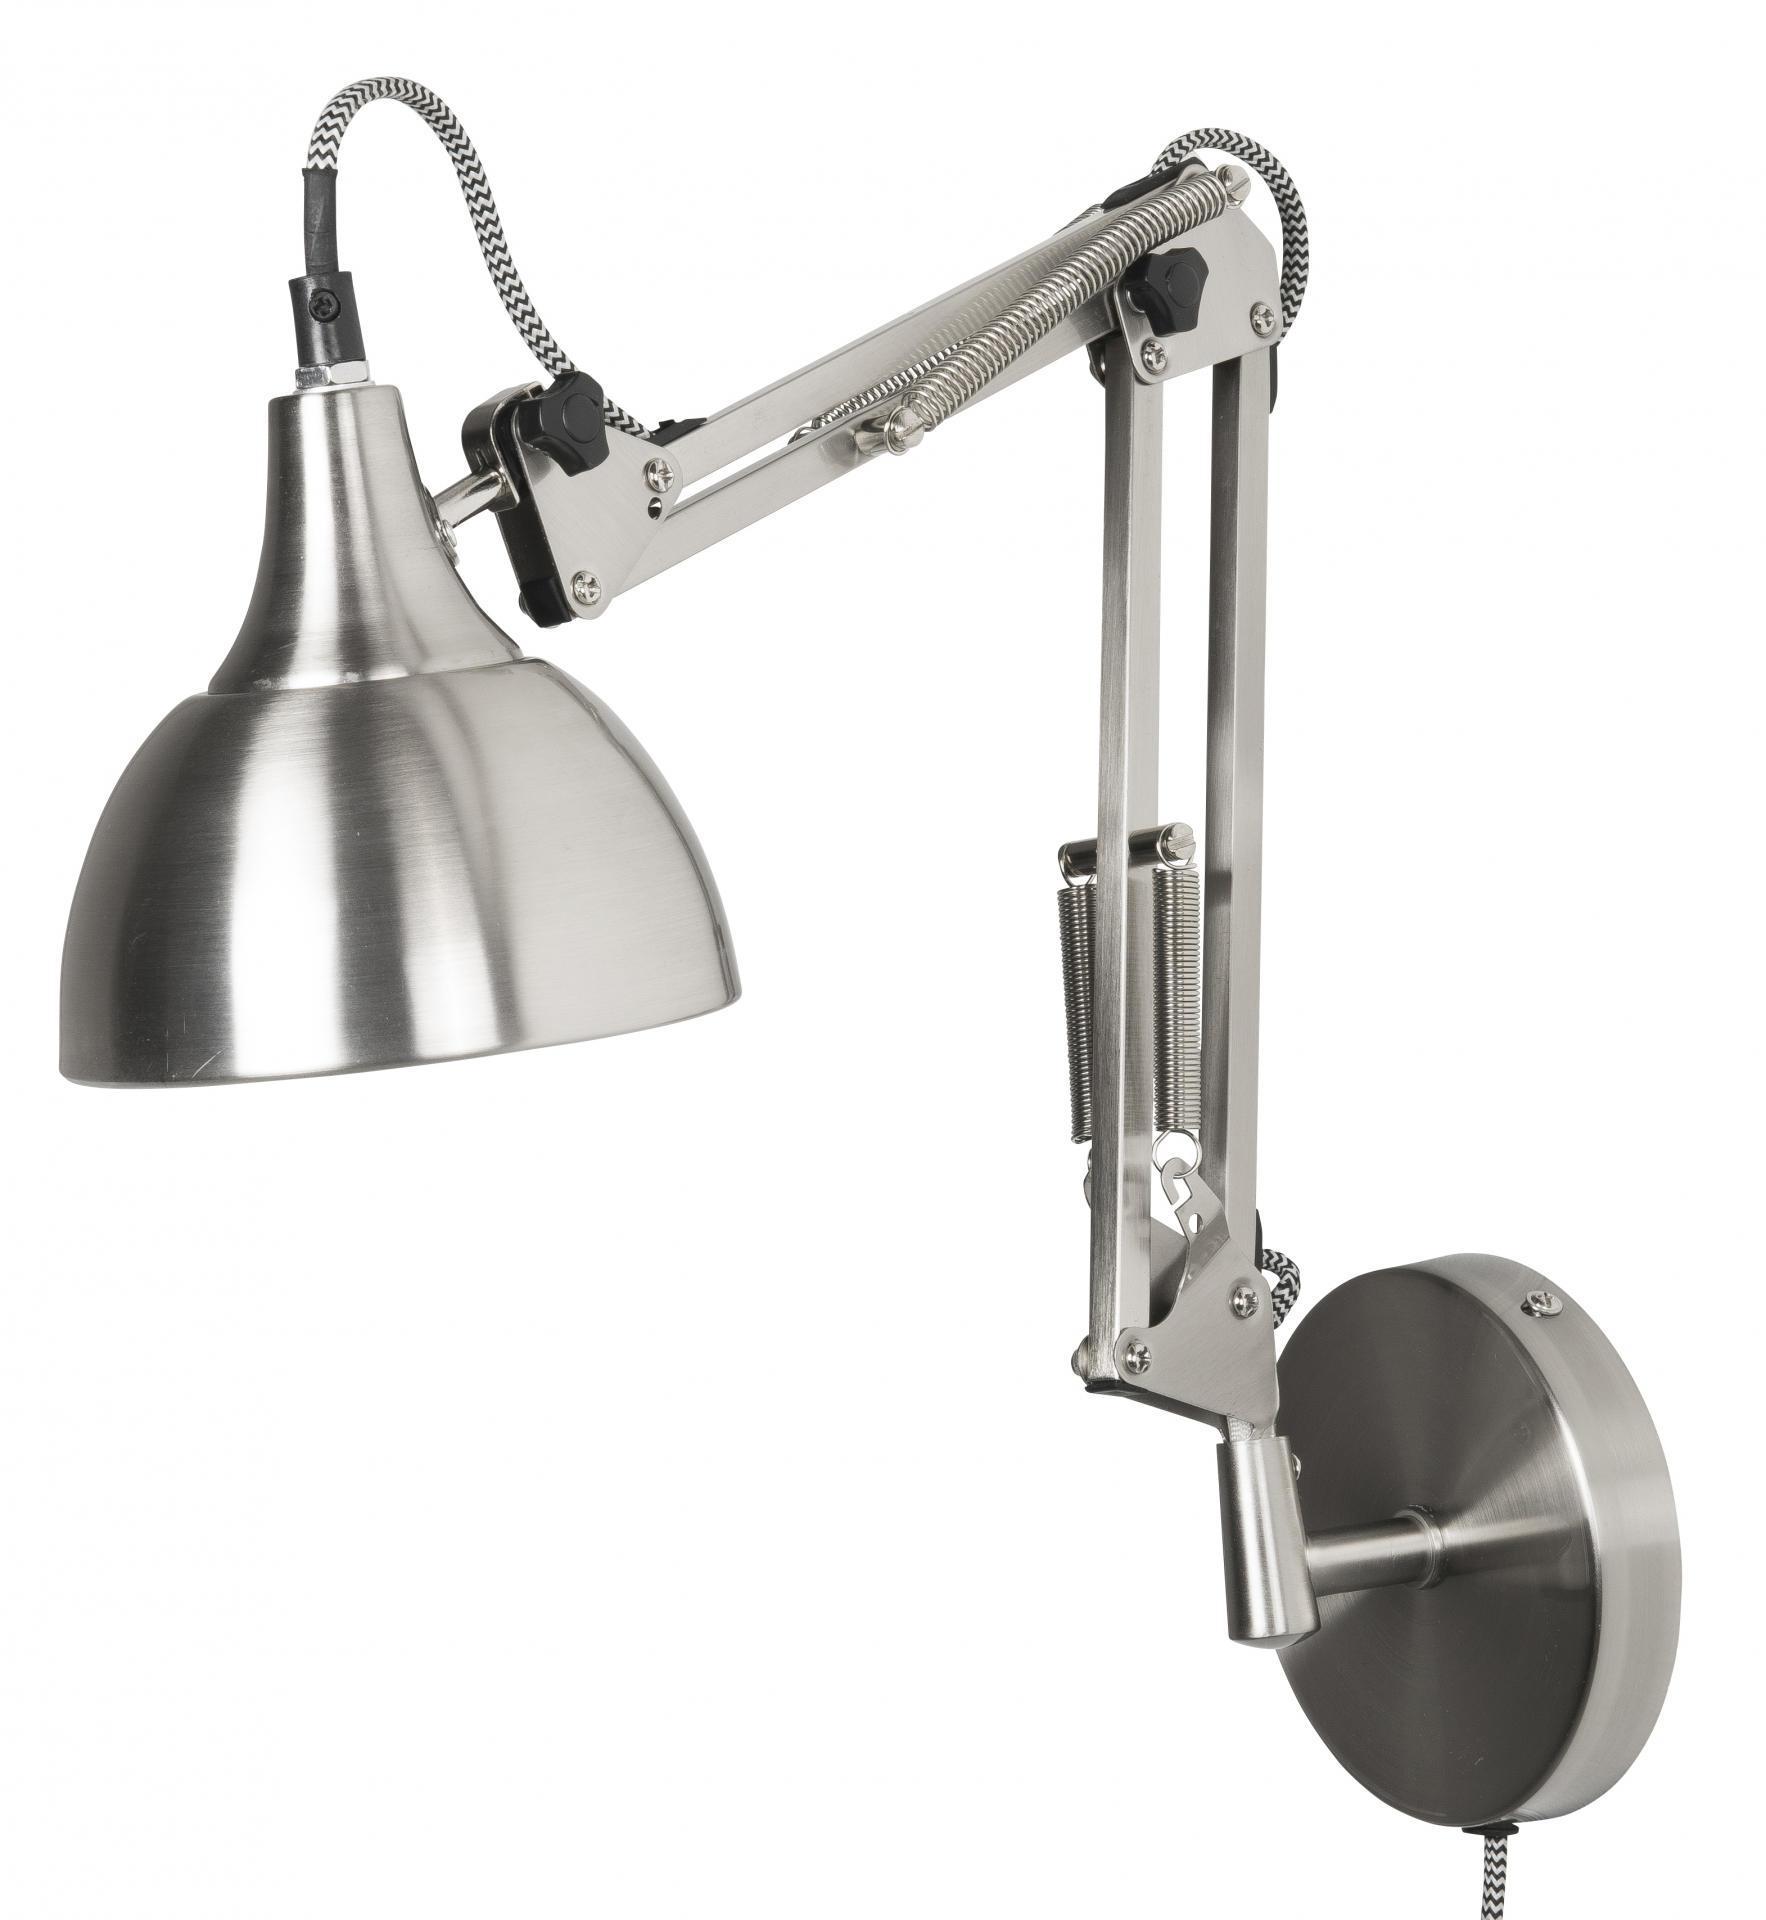 IB LAURSEN Nástěnná lampa Architect Silver, stříbrná barva, kov